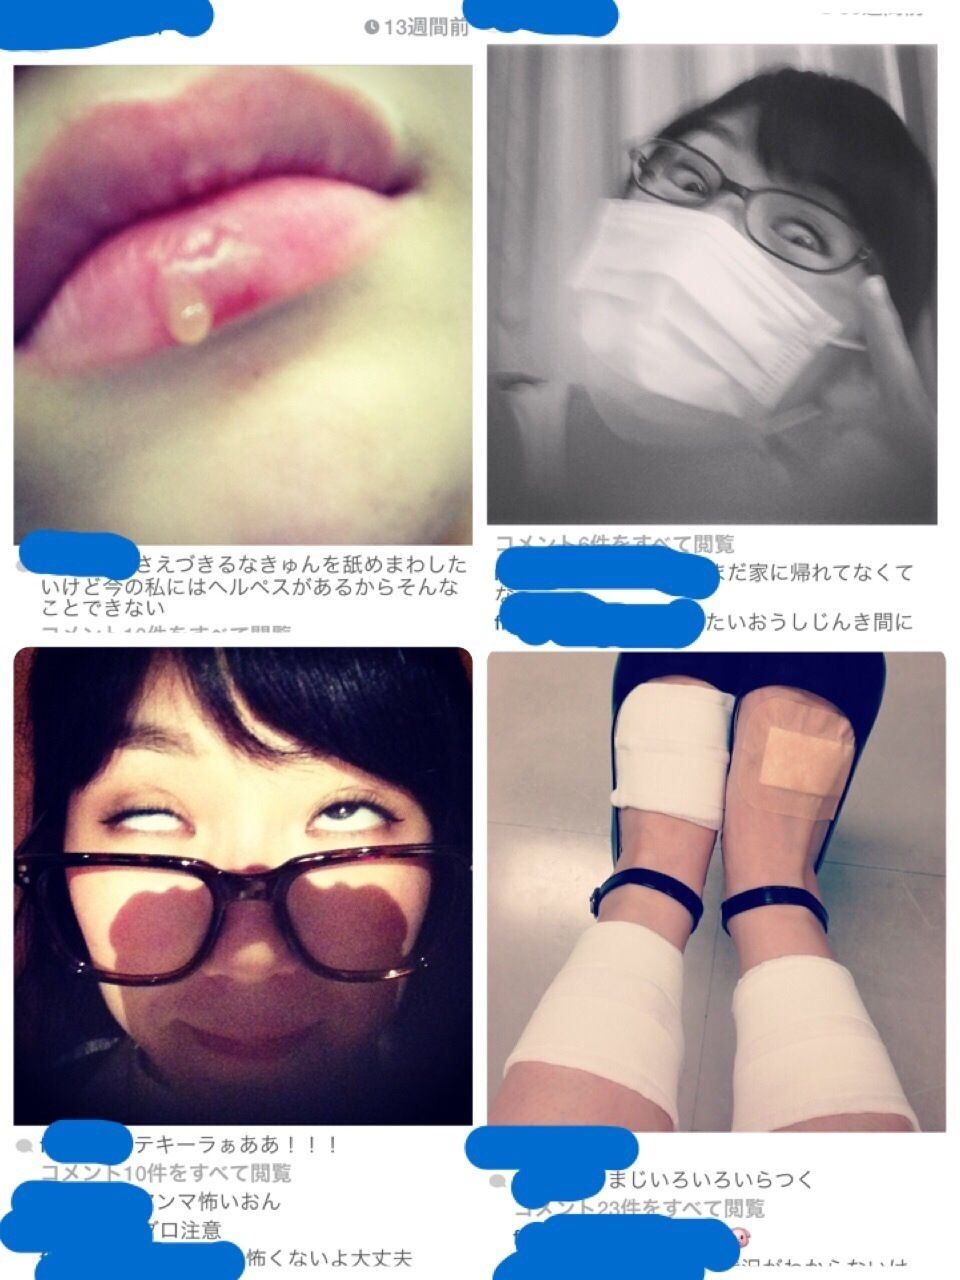 https://livedoor.blogimg.jp/hellopro2ch/imgs/c/2/c27927f2.jpg